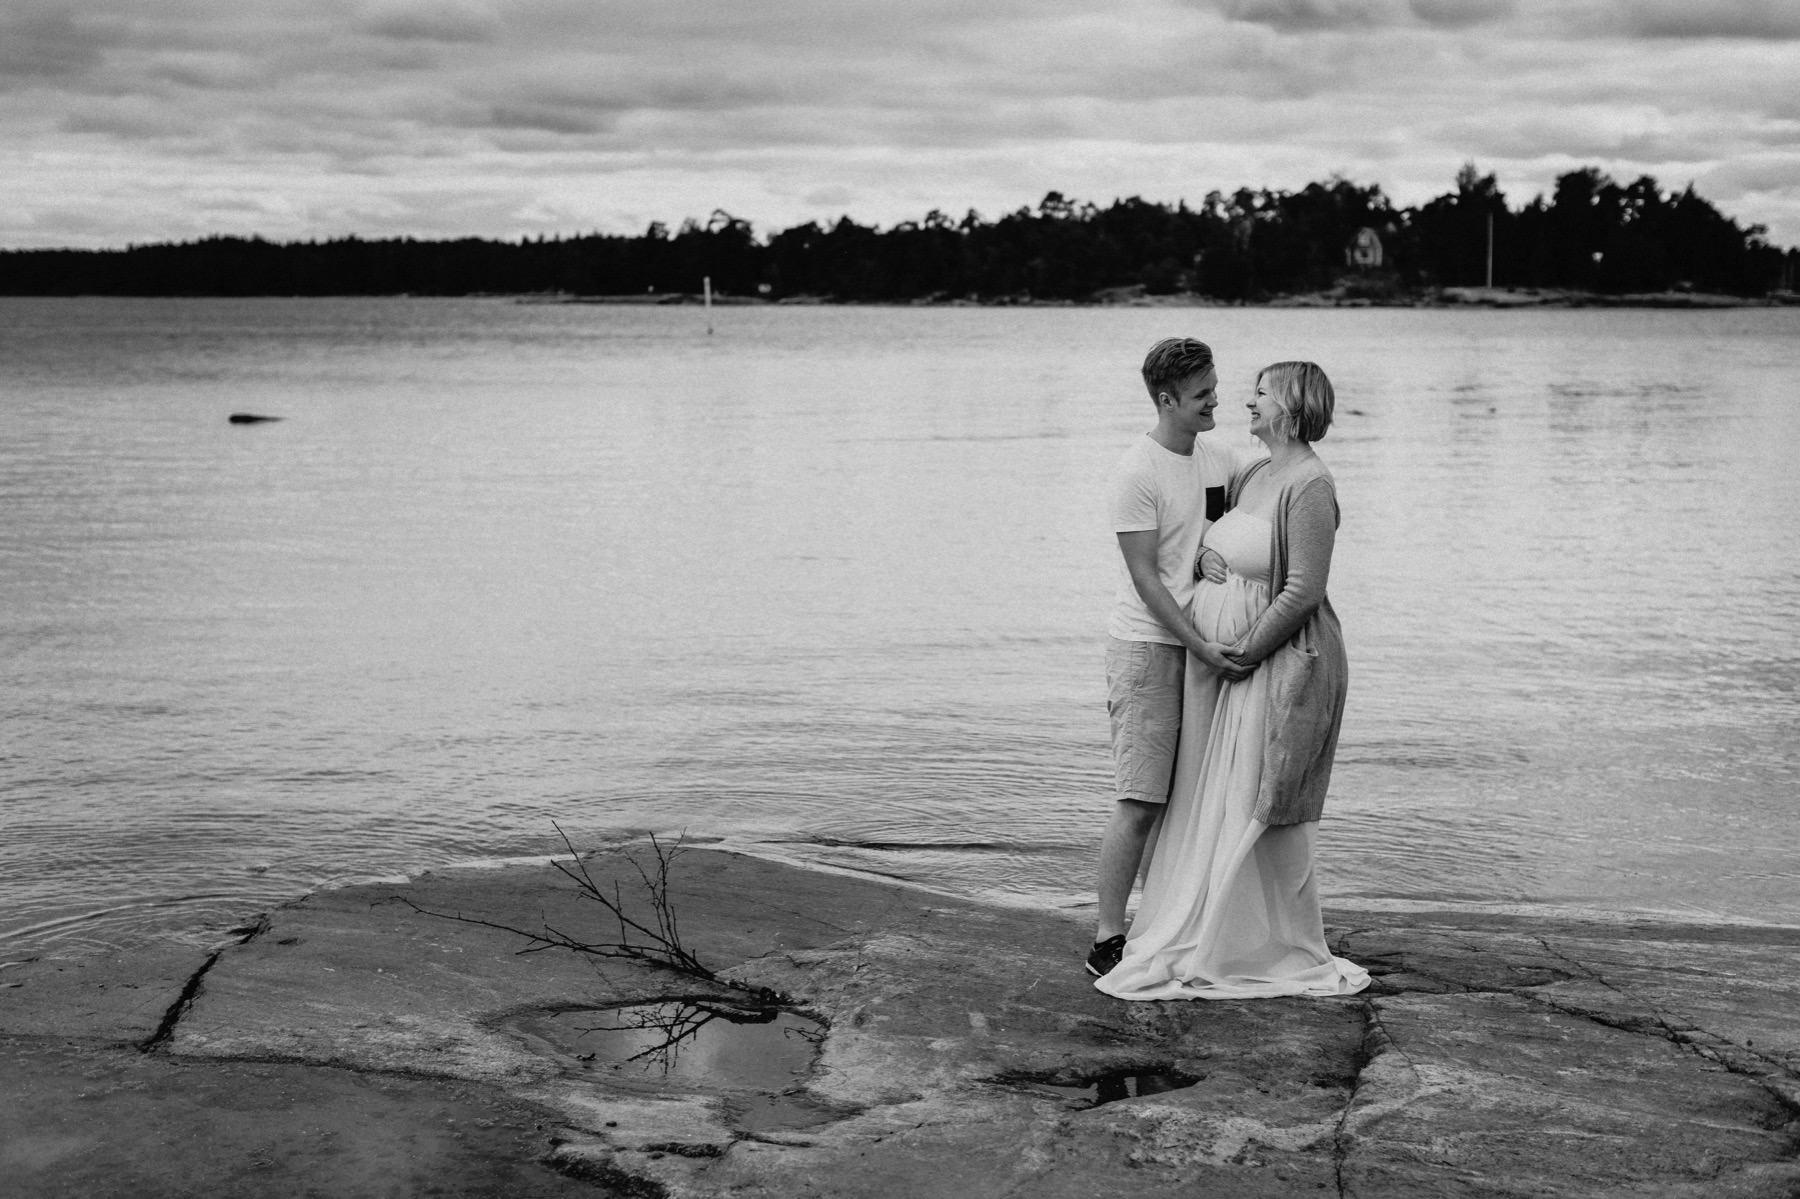 aternity Photographer Helsinki